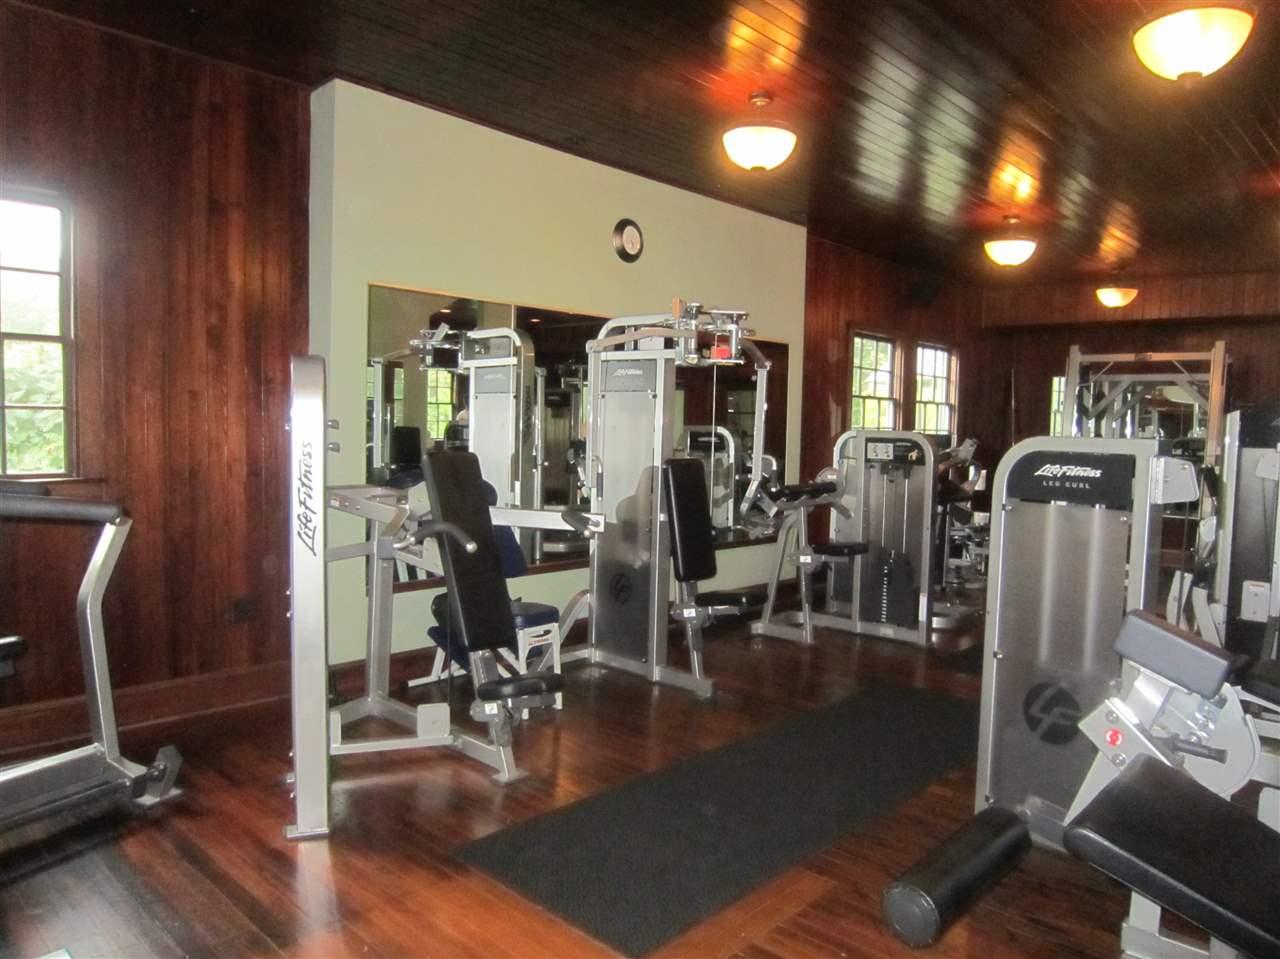 Enjoy a workout here 11183545